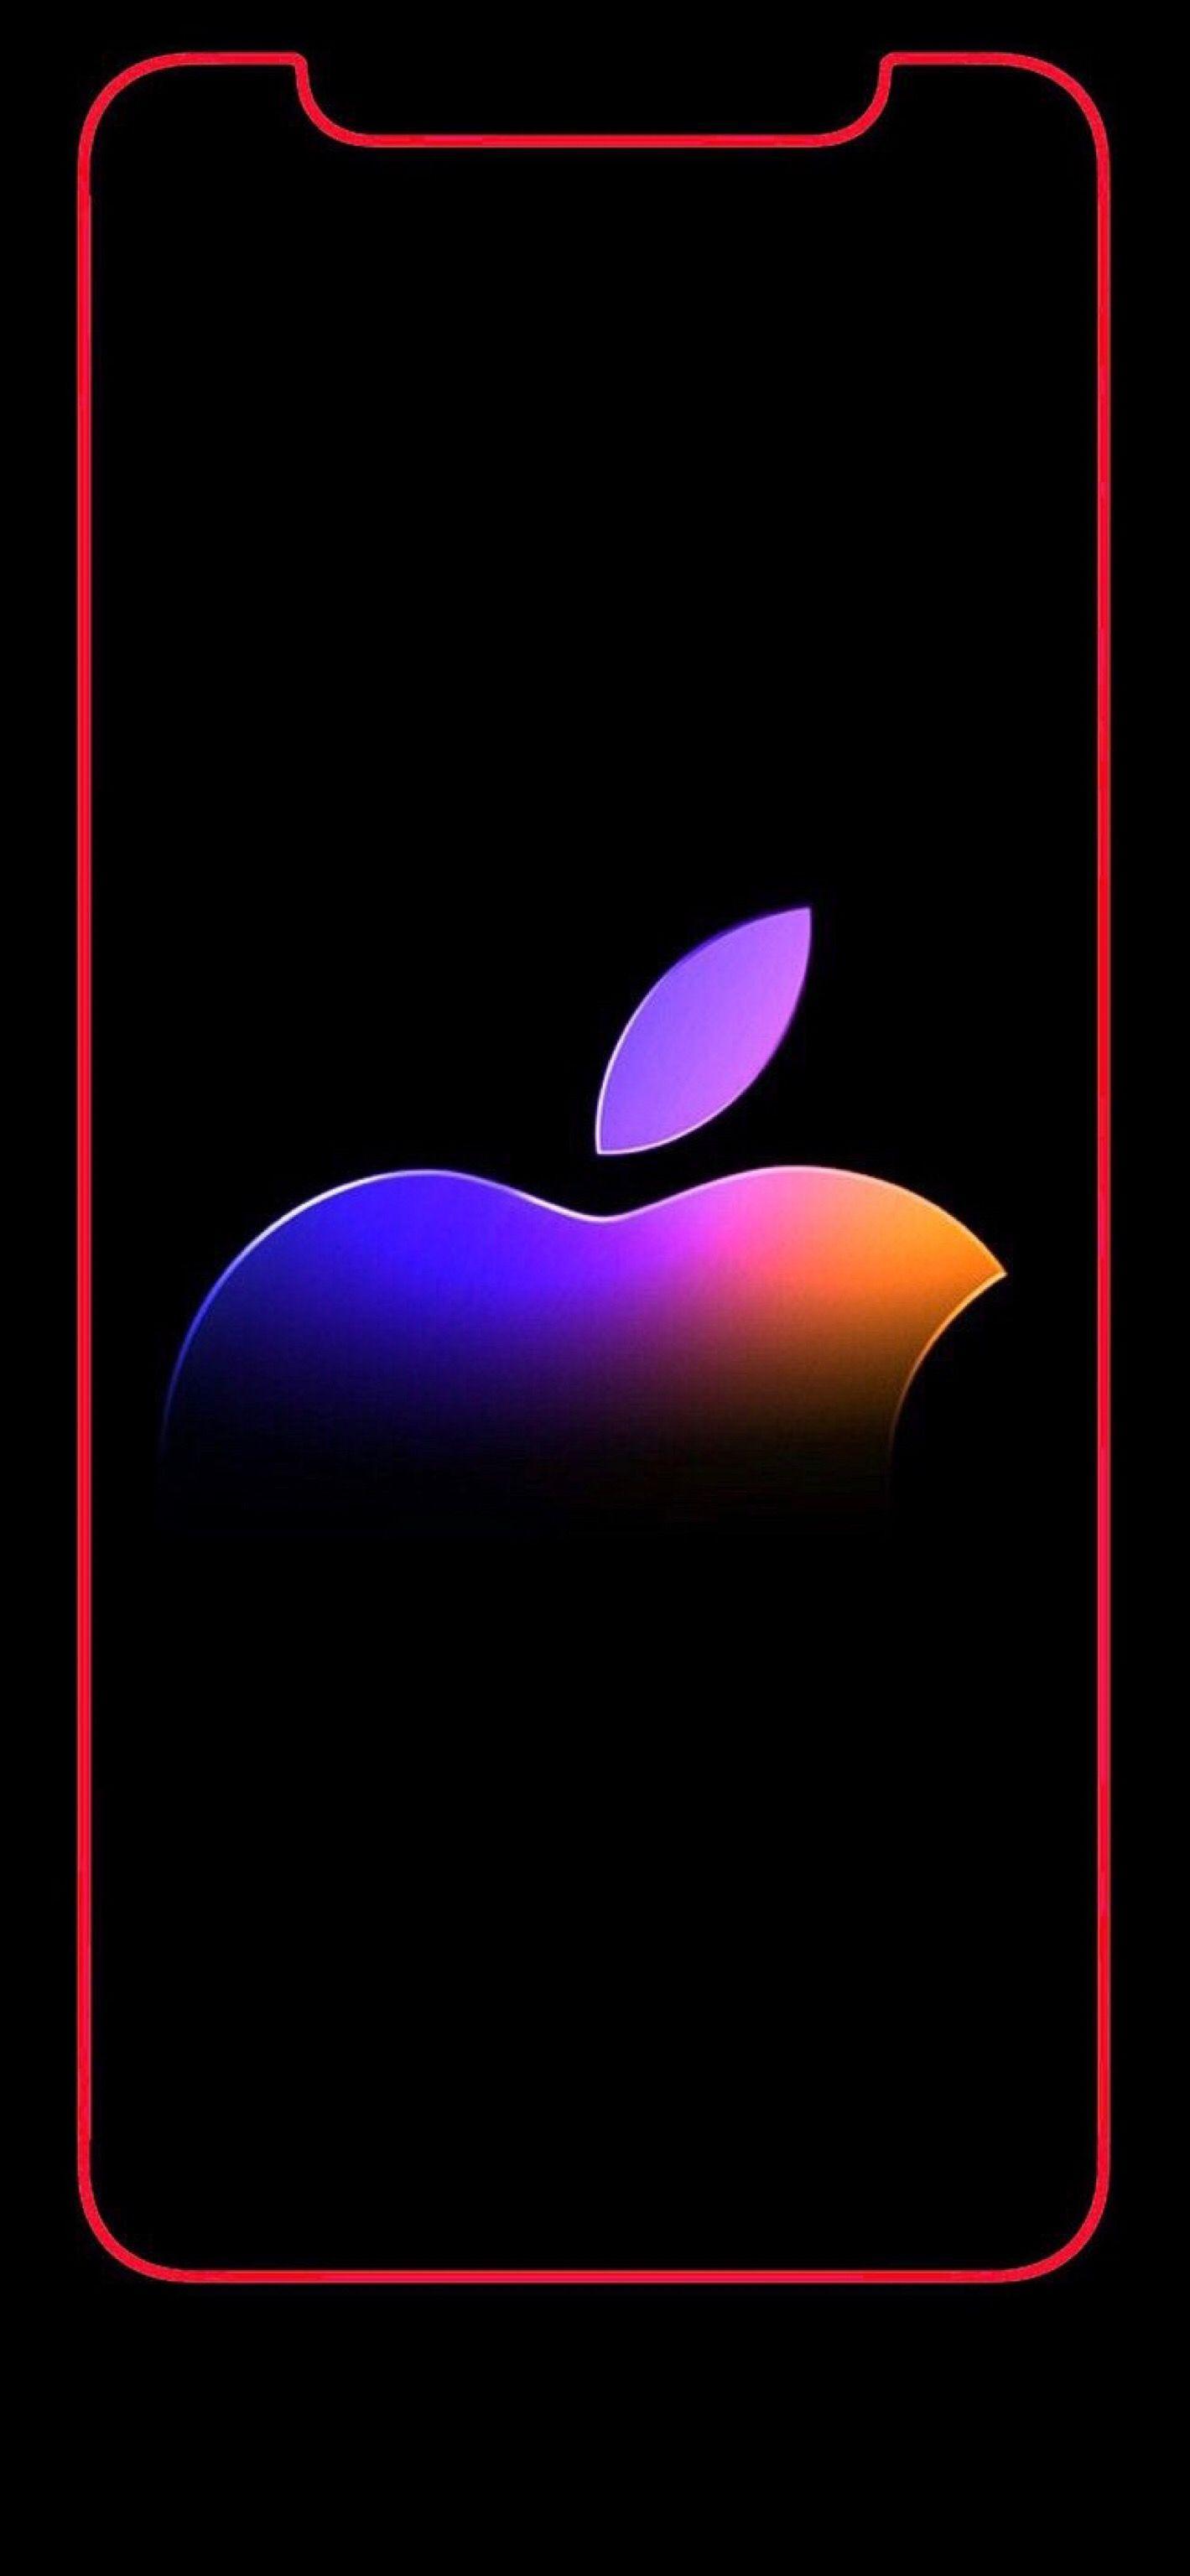 Retro Apple Logo Wallpapers Top Free Retro Apple Logo